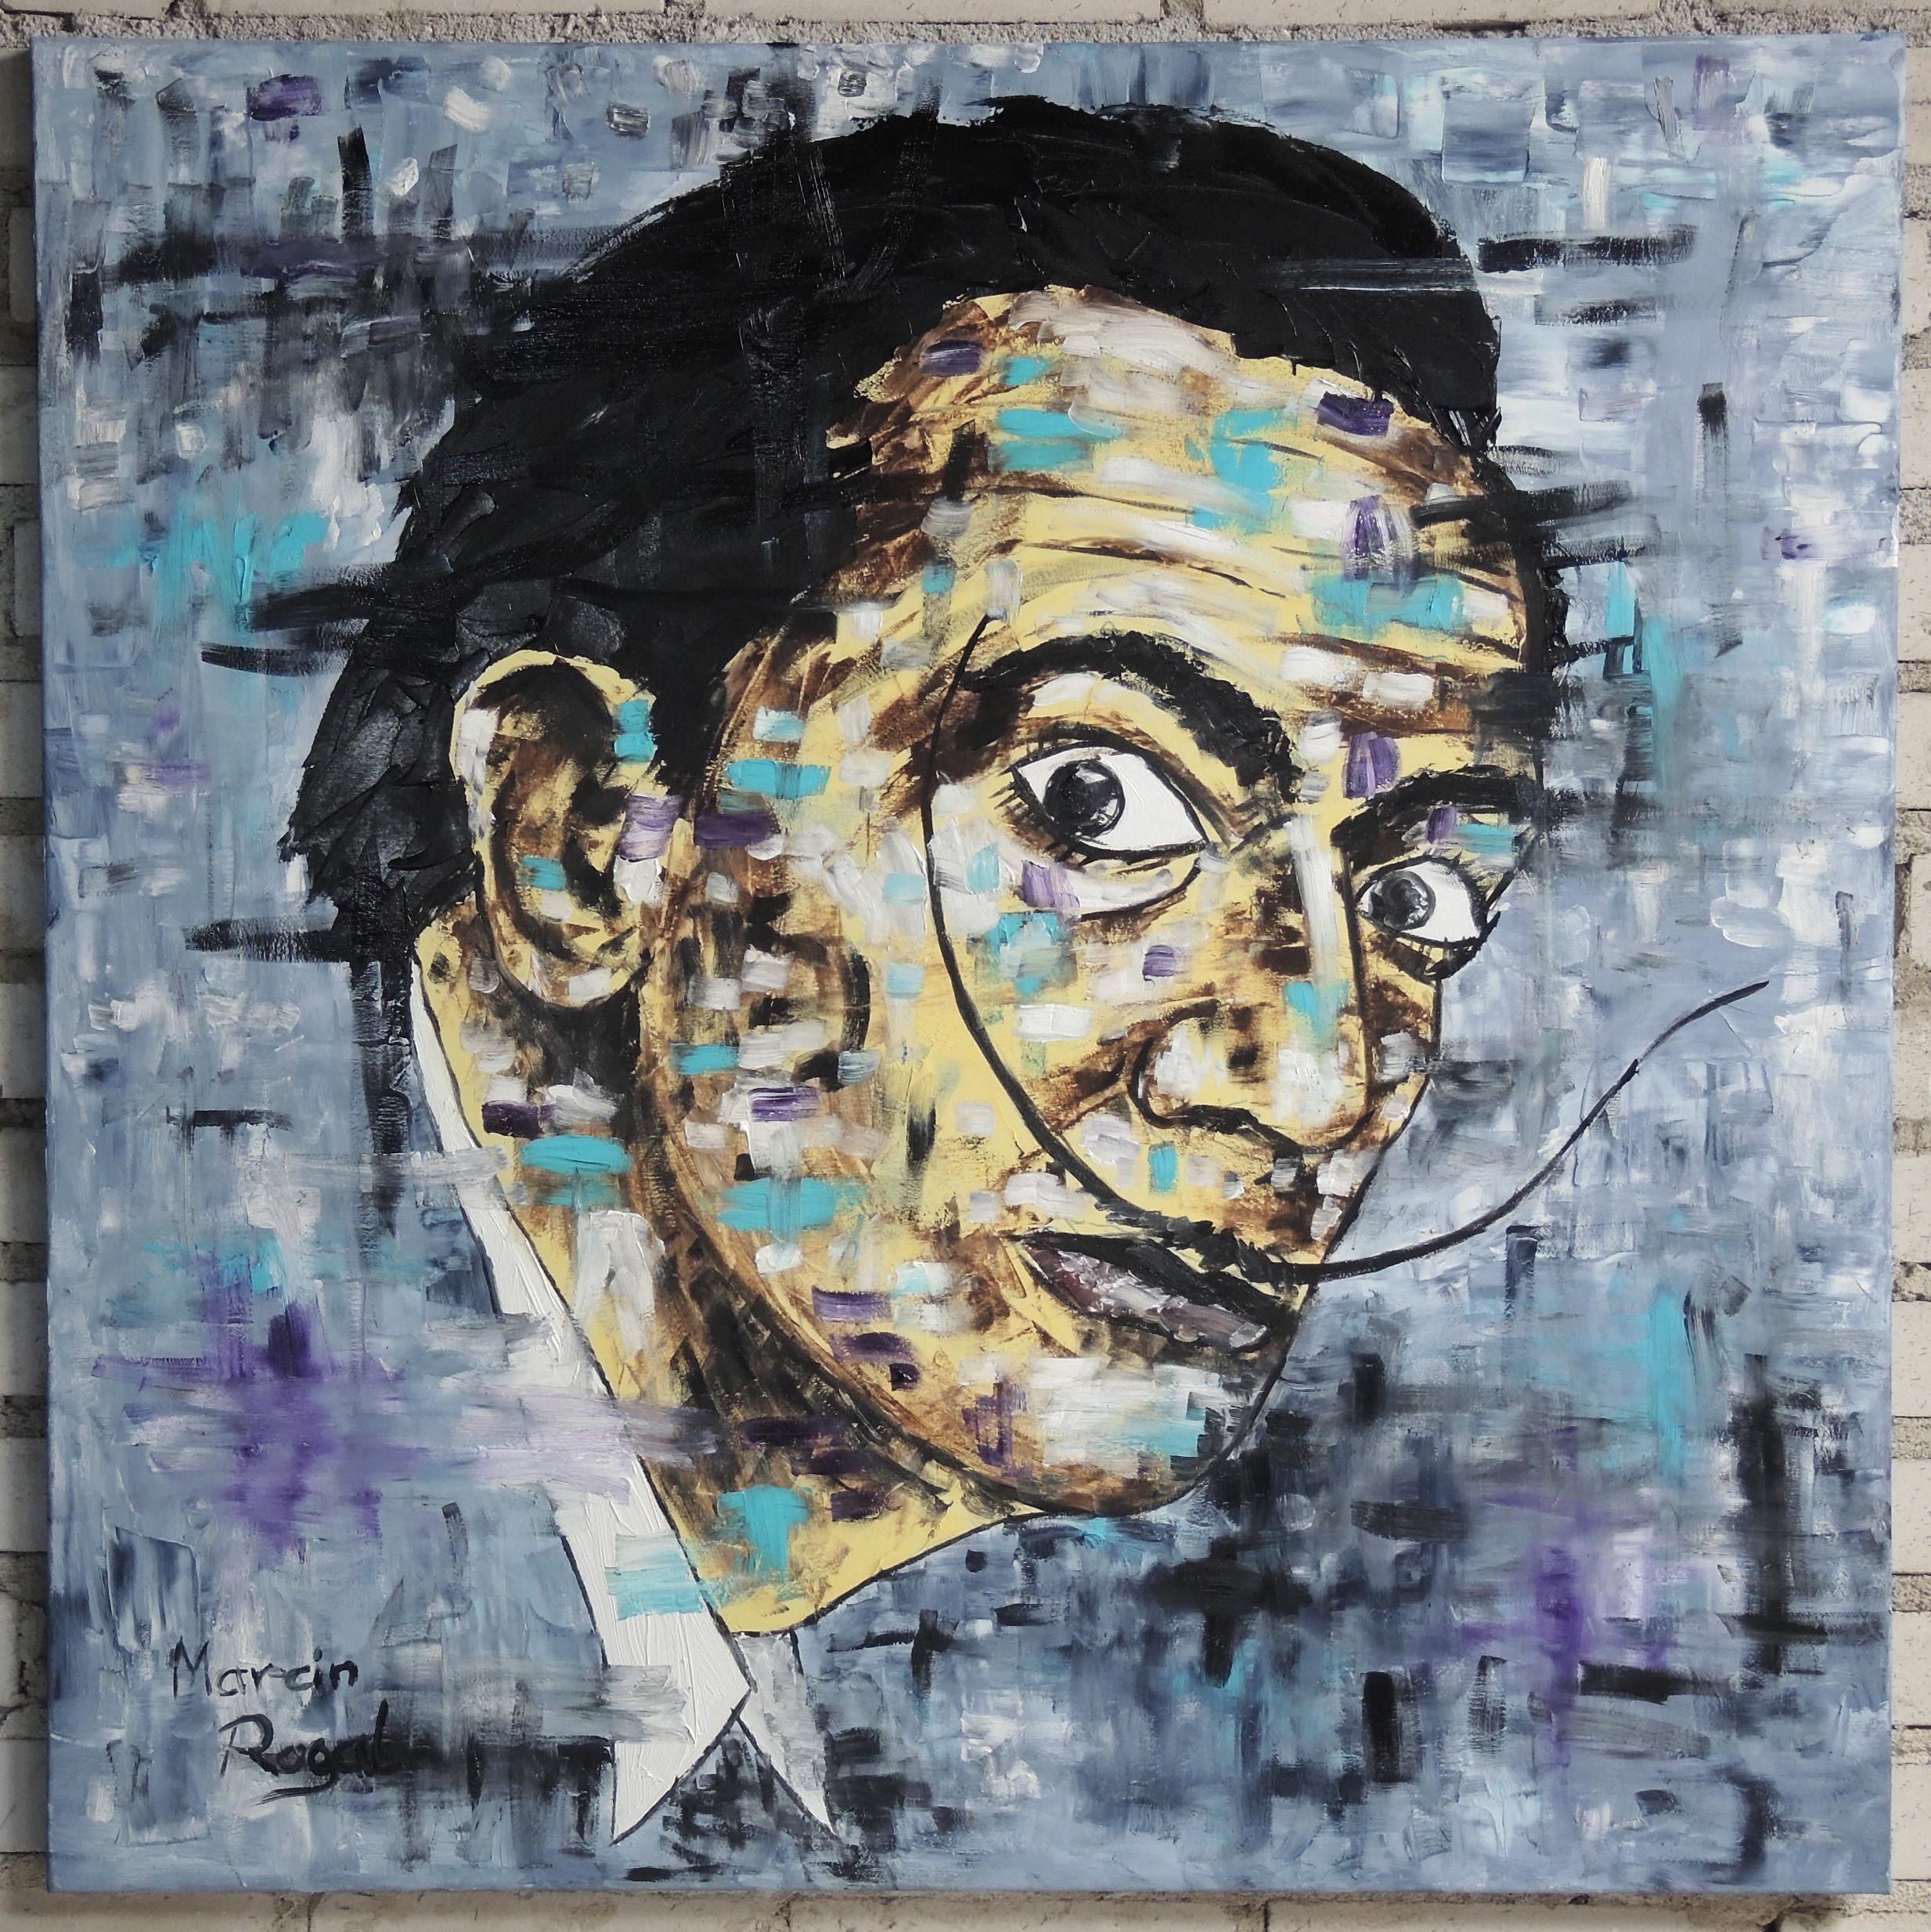 salvador-dali-painting-art-marcin-rogal-artwork